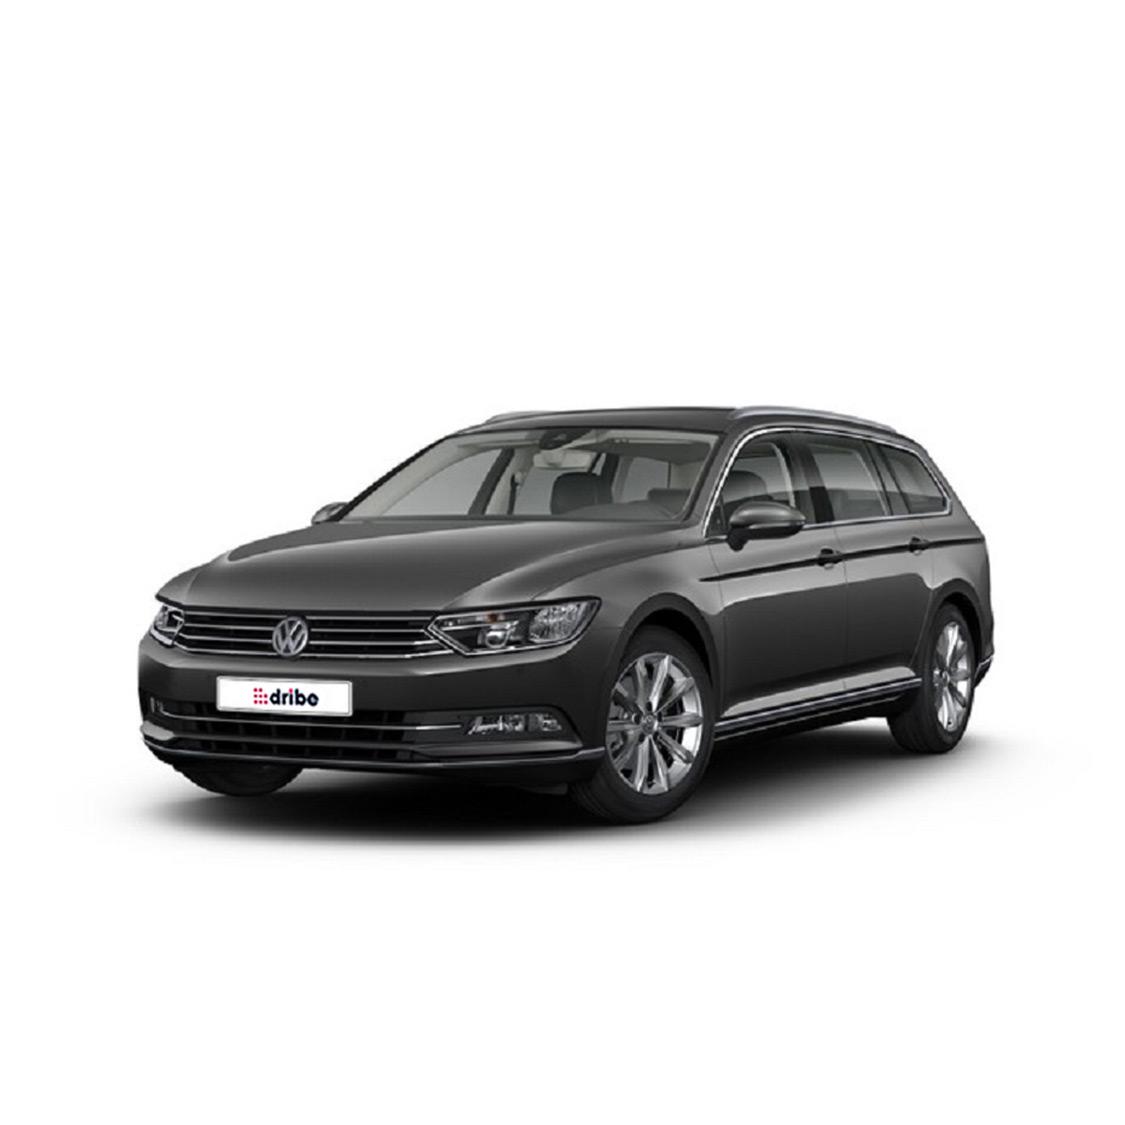 VW Passat Variant Highline Premium 2,0 TDI